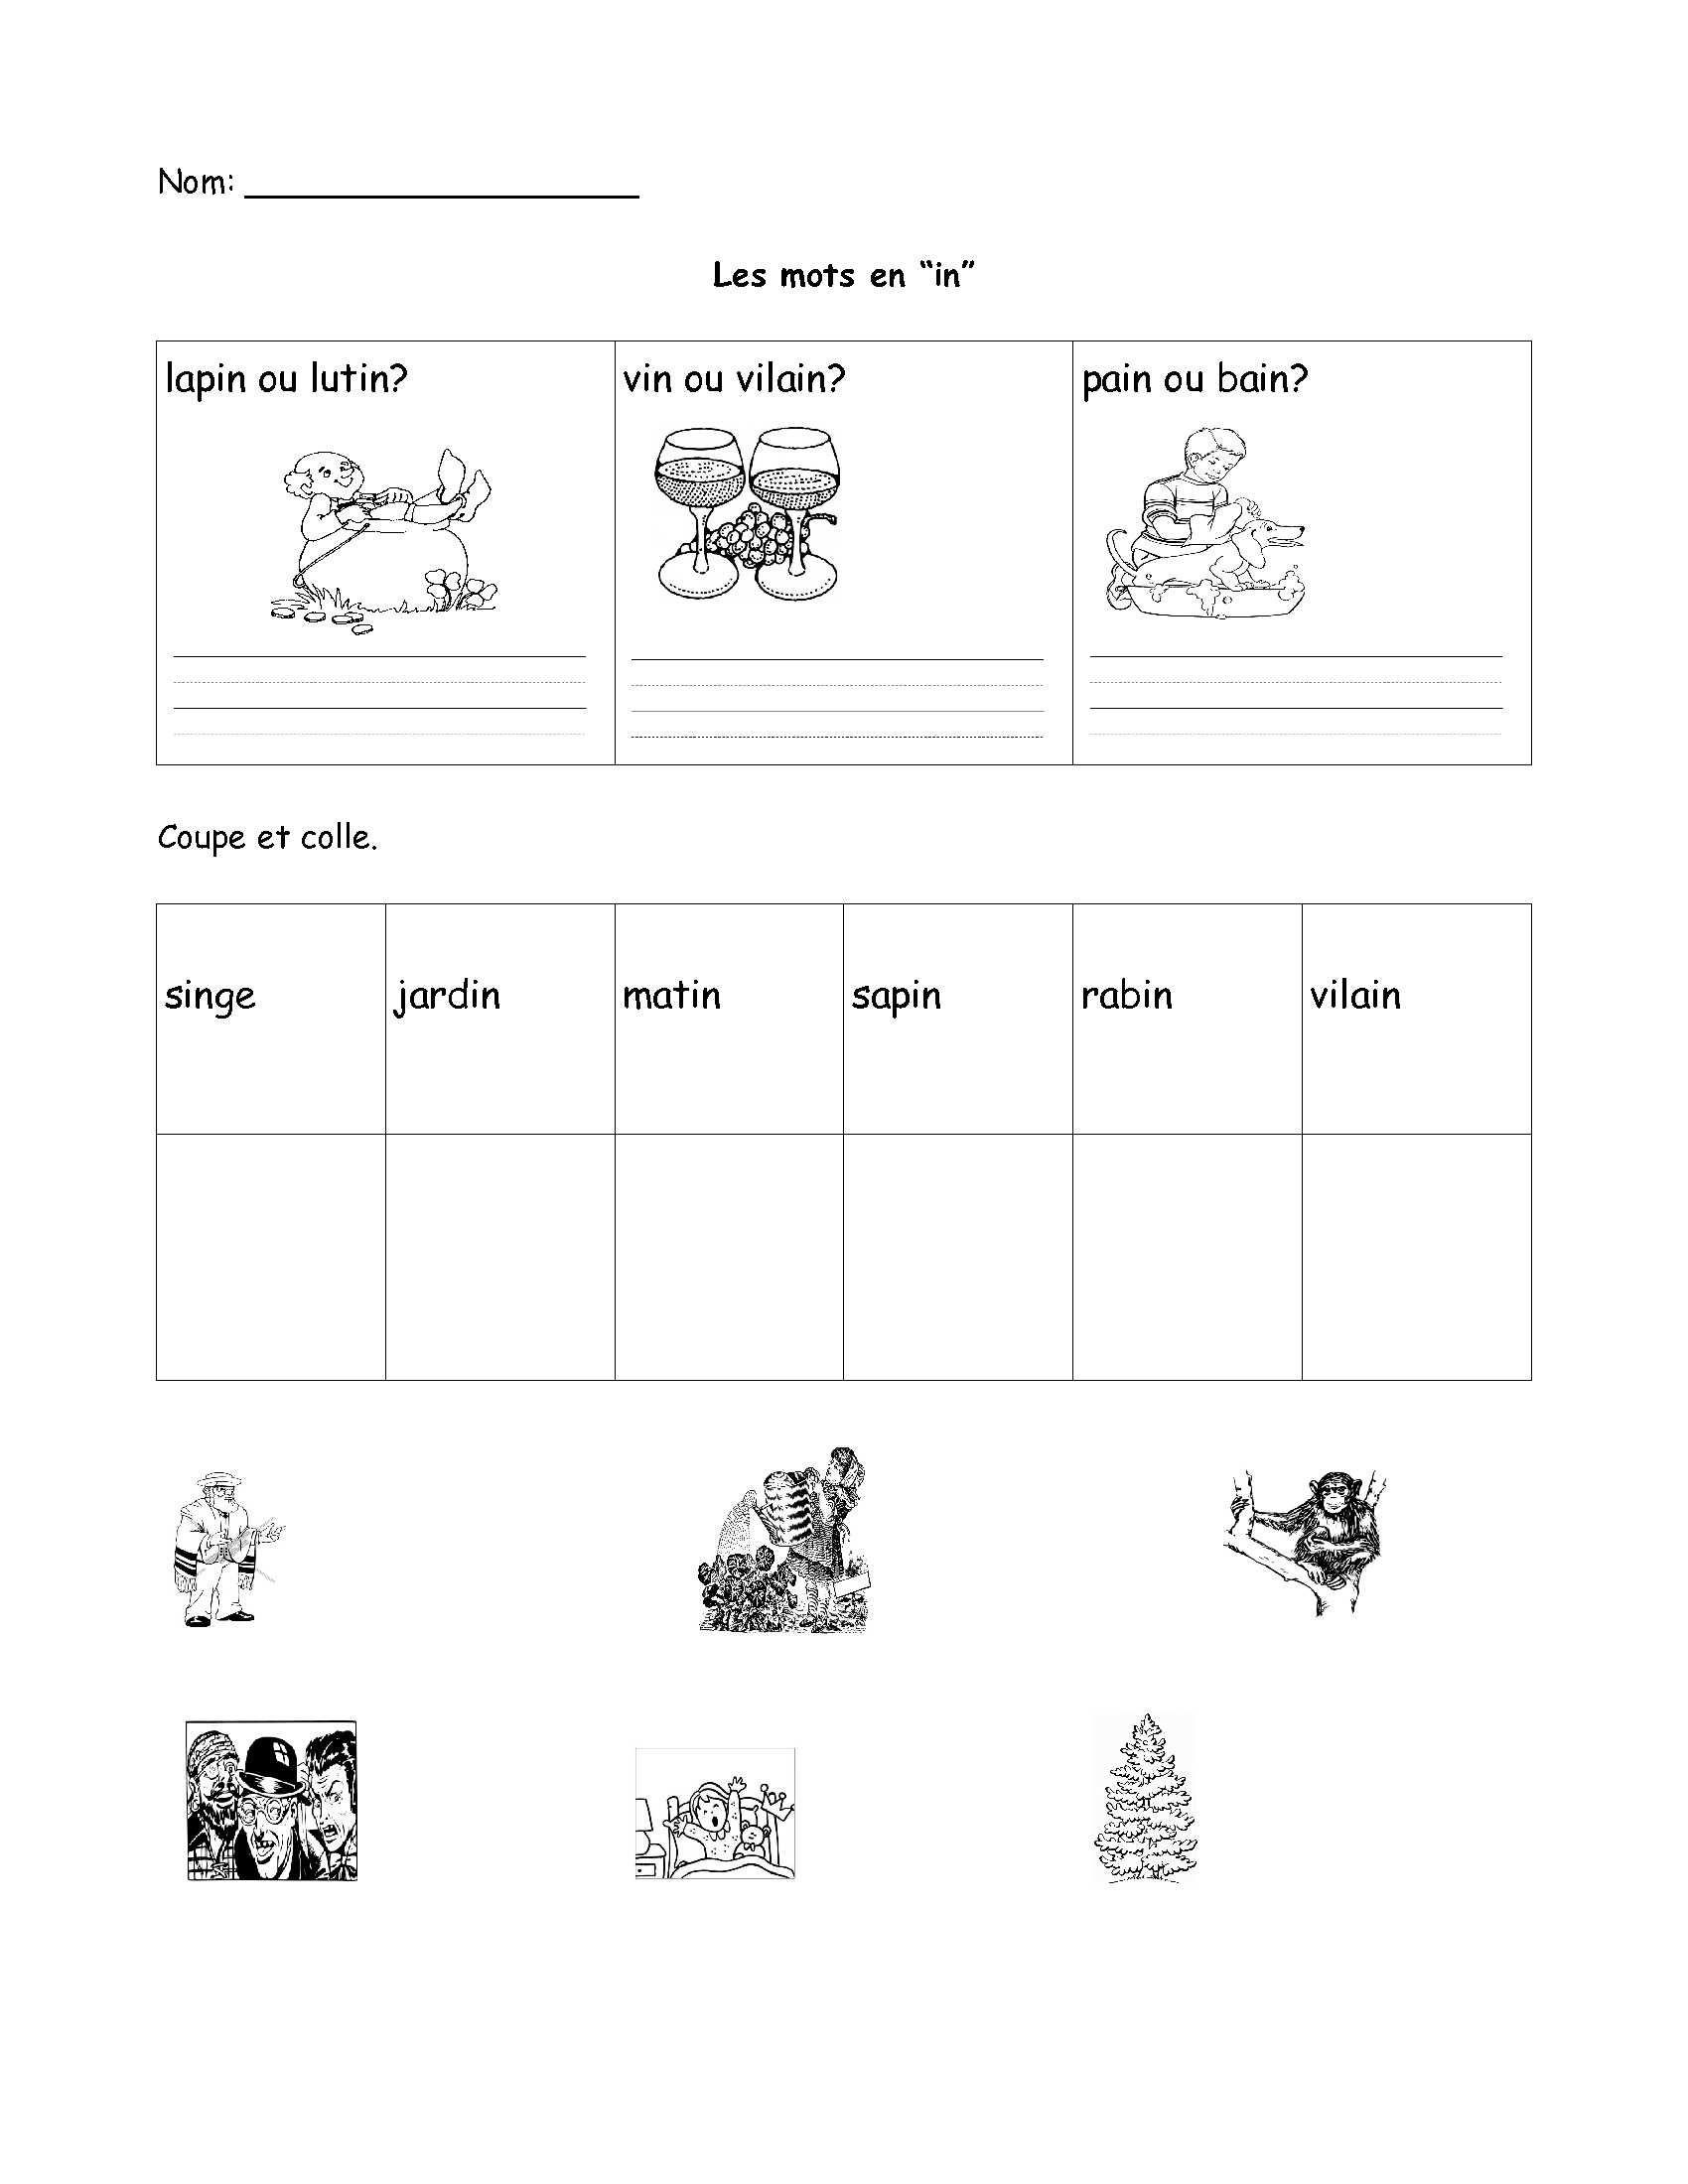 Free French Worksheet- Grade 1, Grade 2, Grade 3. Fsl, Core French   Free Printable French Worksheets For Grade 1